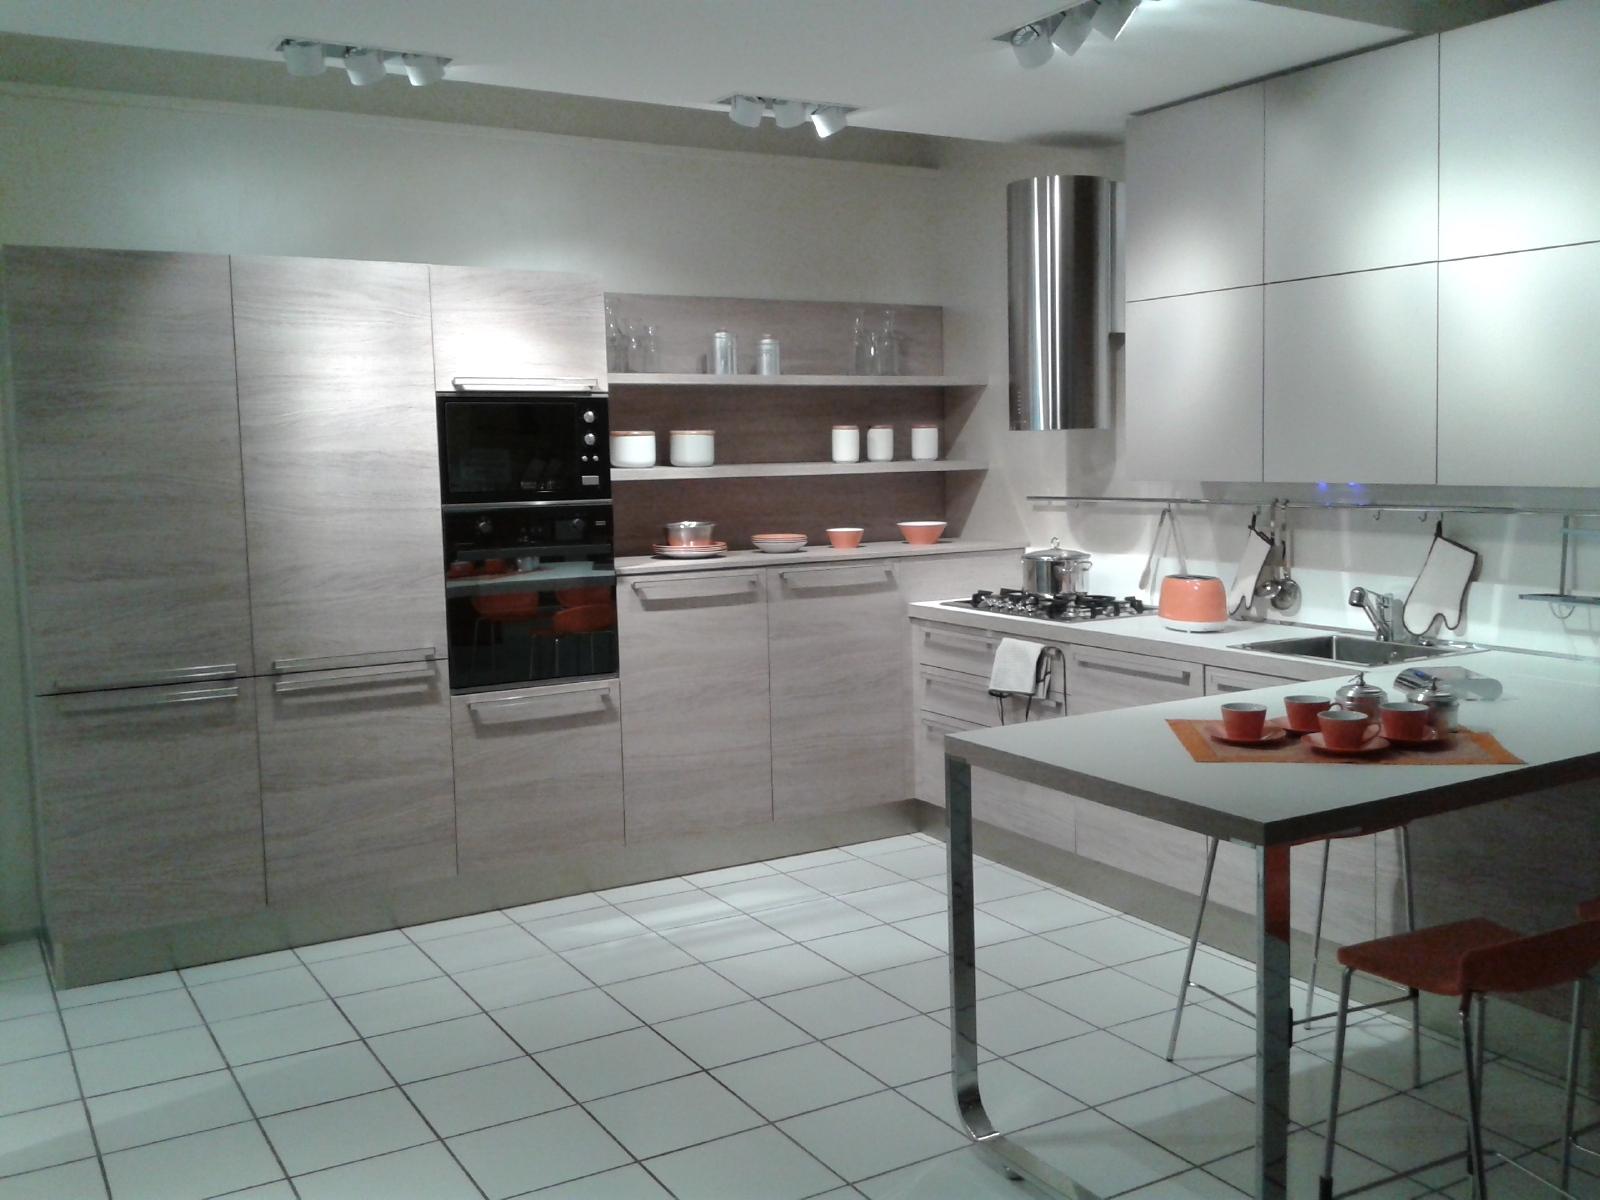 Cucina Veneta Cucine Ethica Decorativo Laminato Materico Cucine A  #825449 1600 1200 Veneta Cucine è Una Buona Marca